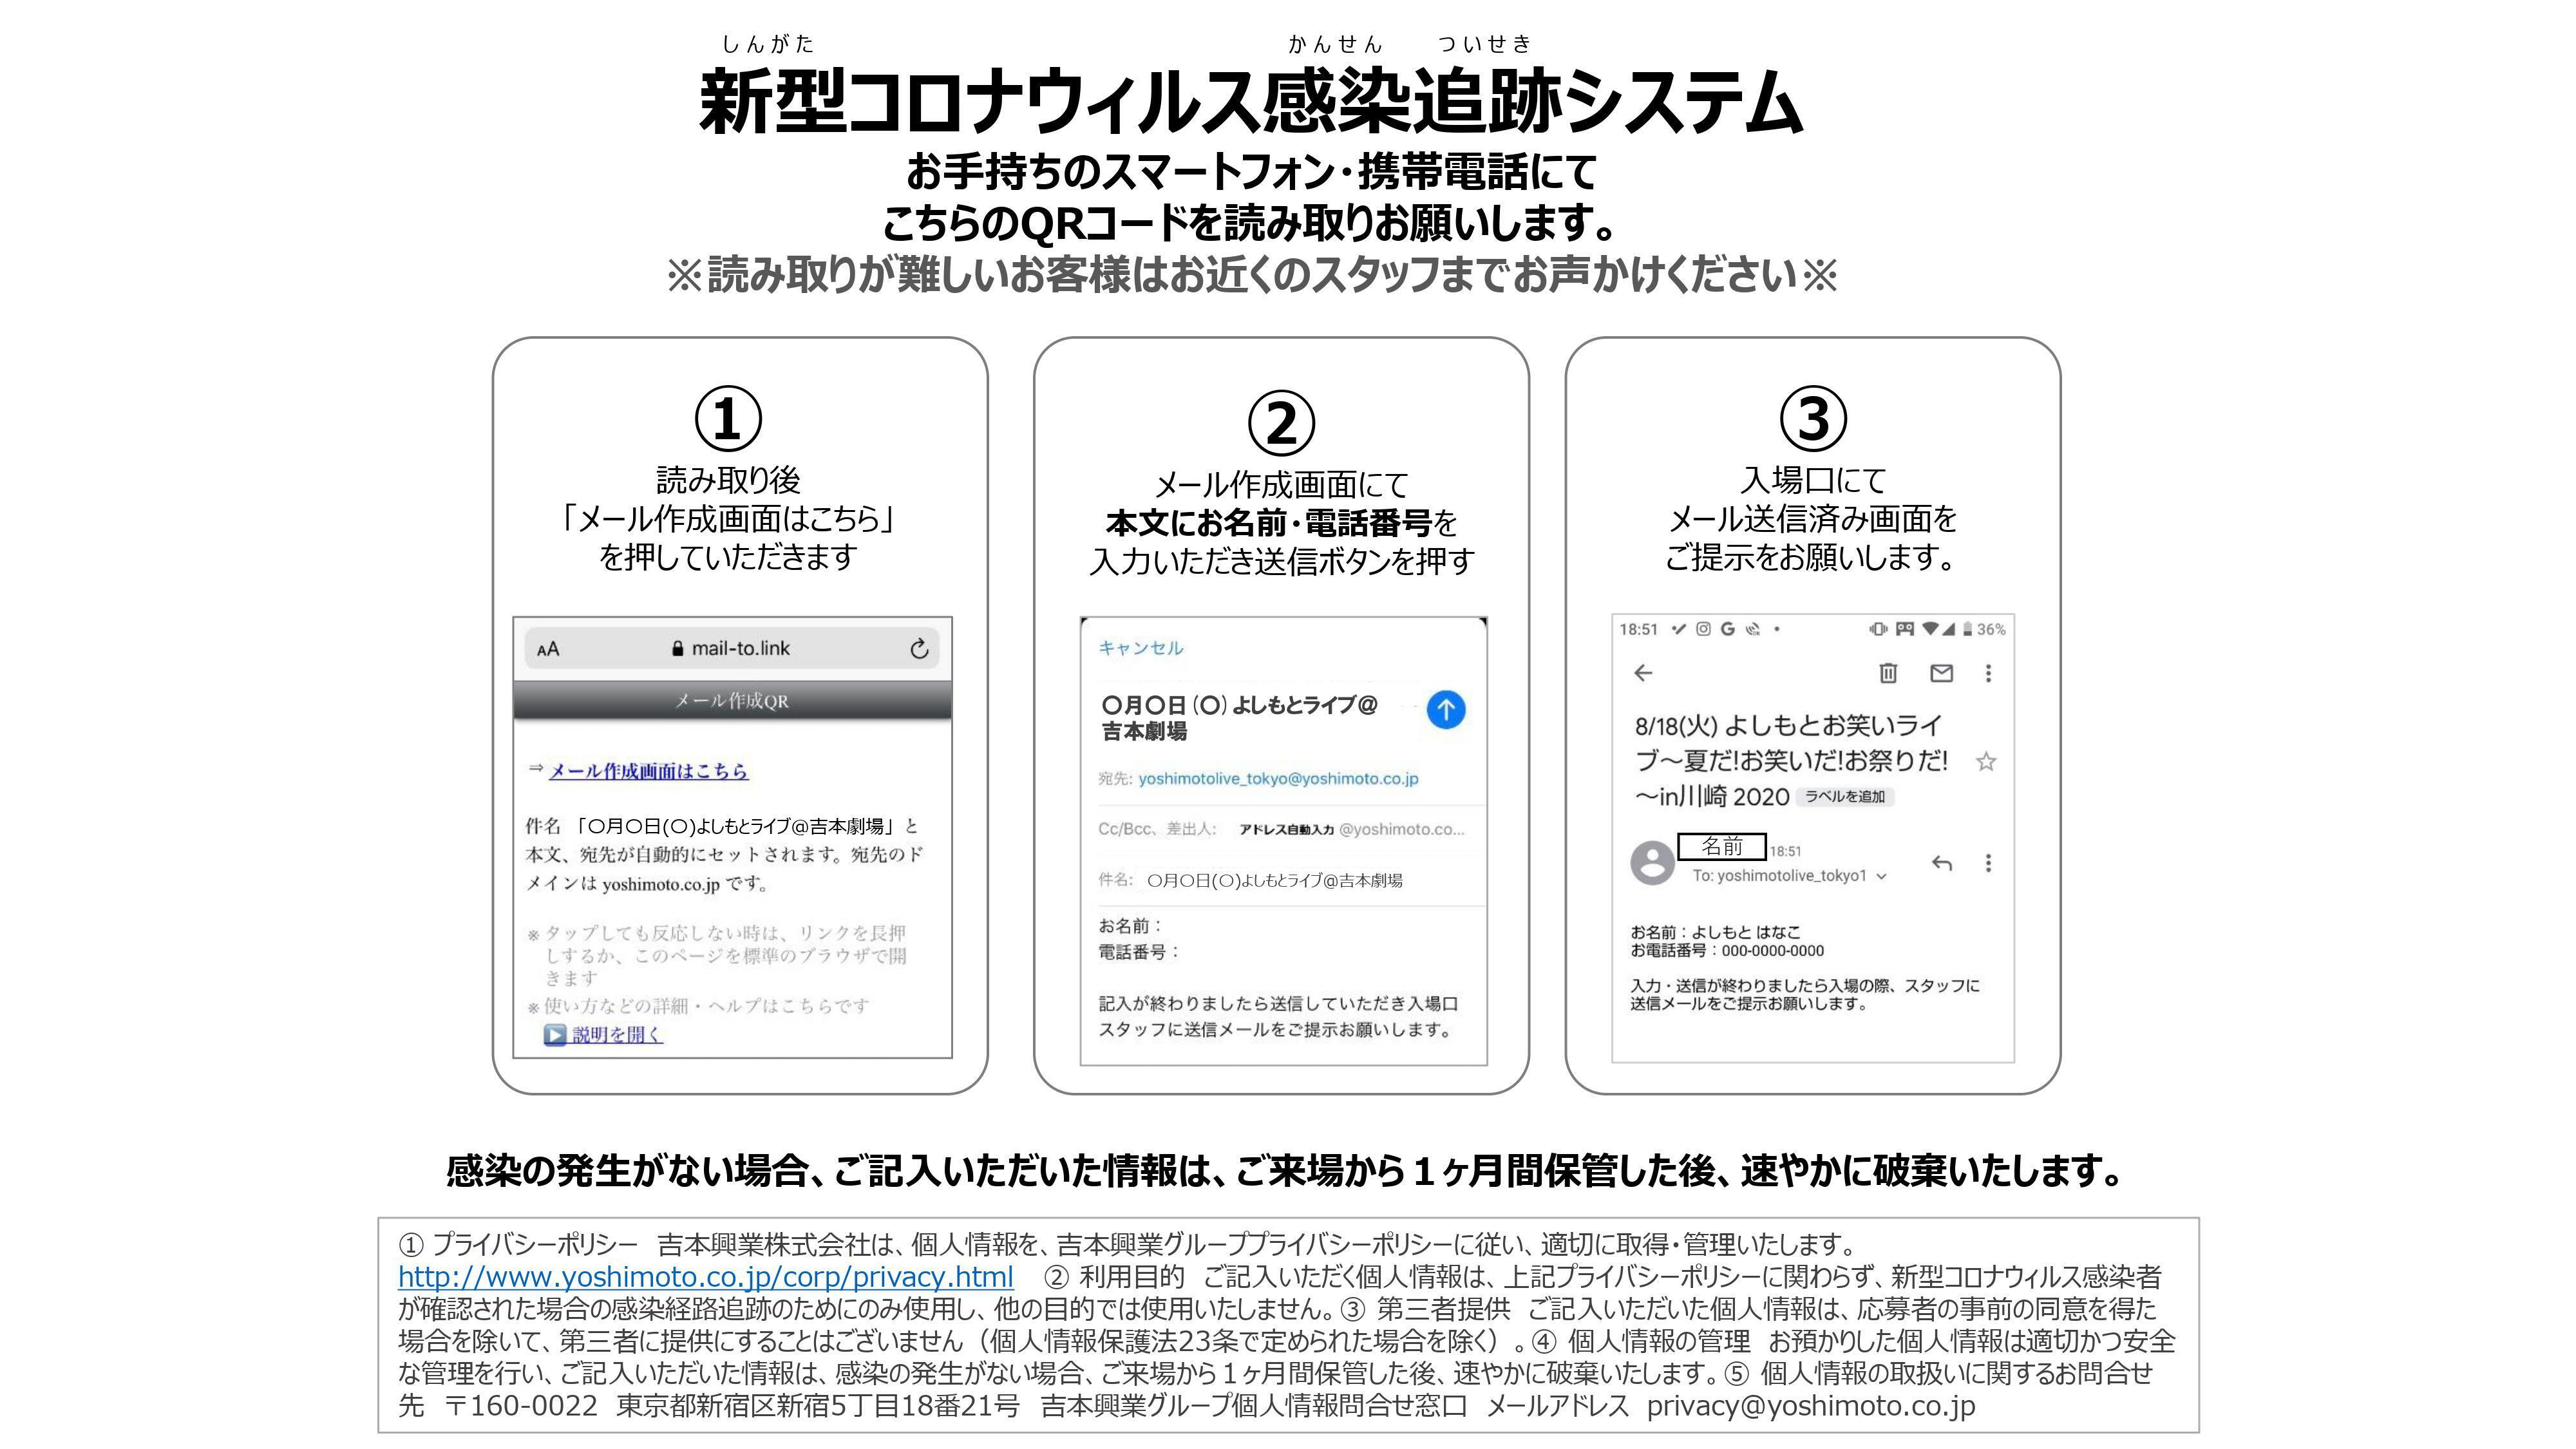 http://www.syumatsu.jp/20200826220019-b0382c09372f514b7c86f5ea9b3f164fc6cf0036.jpg